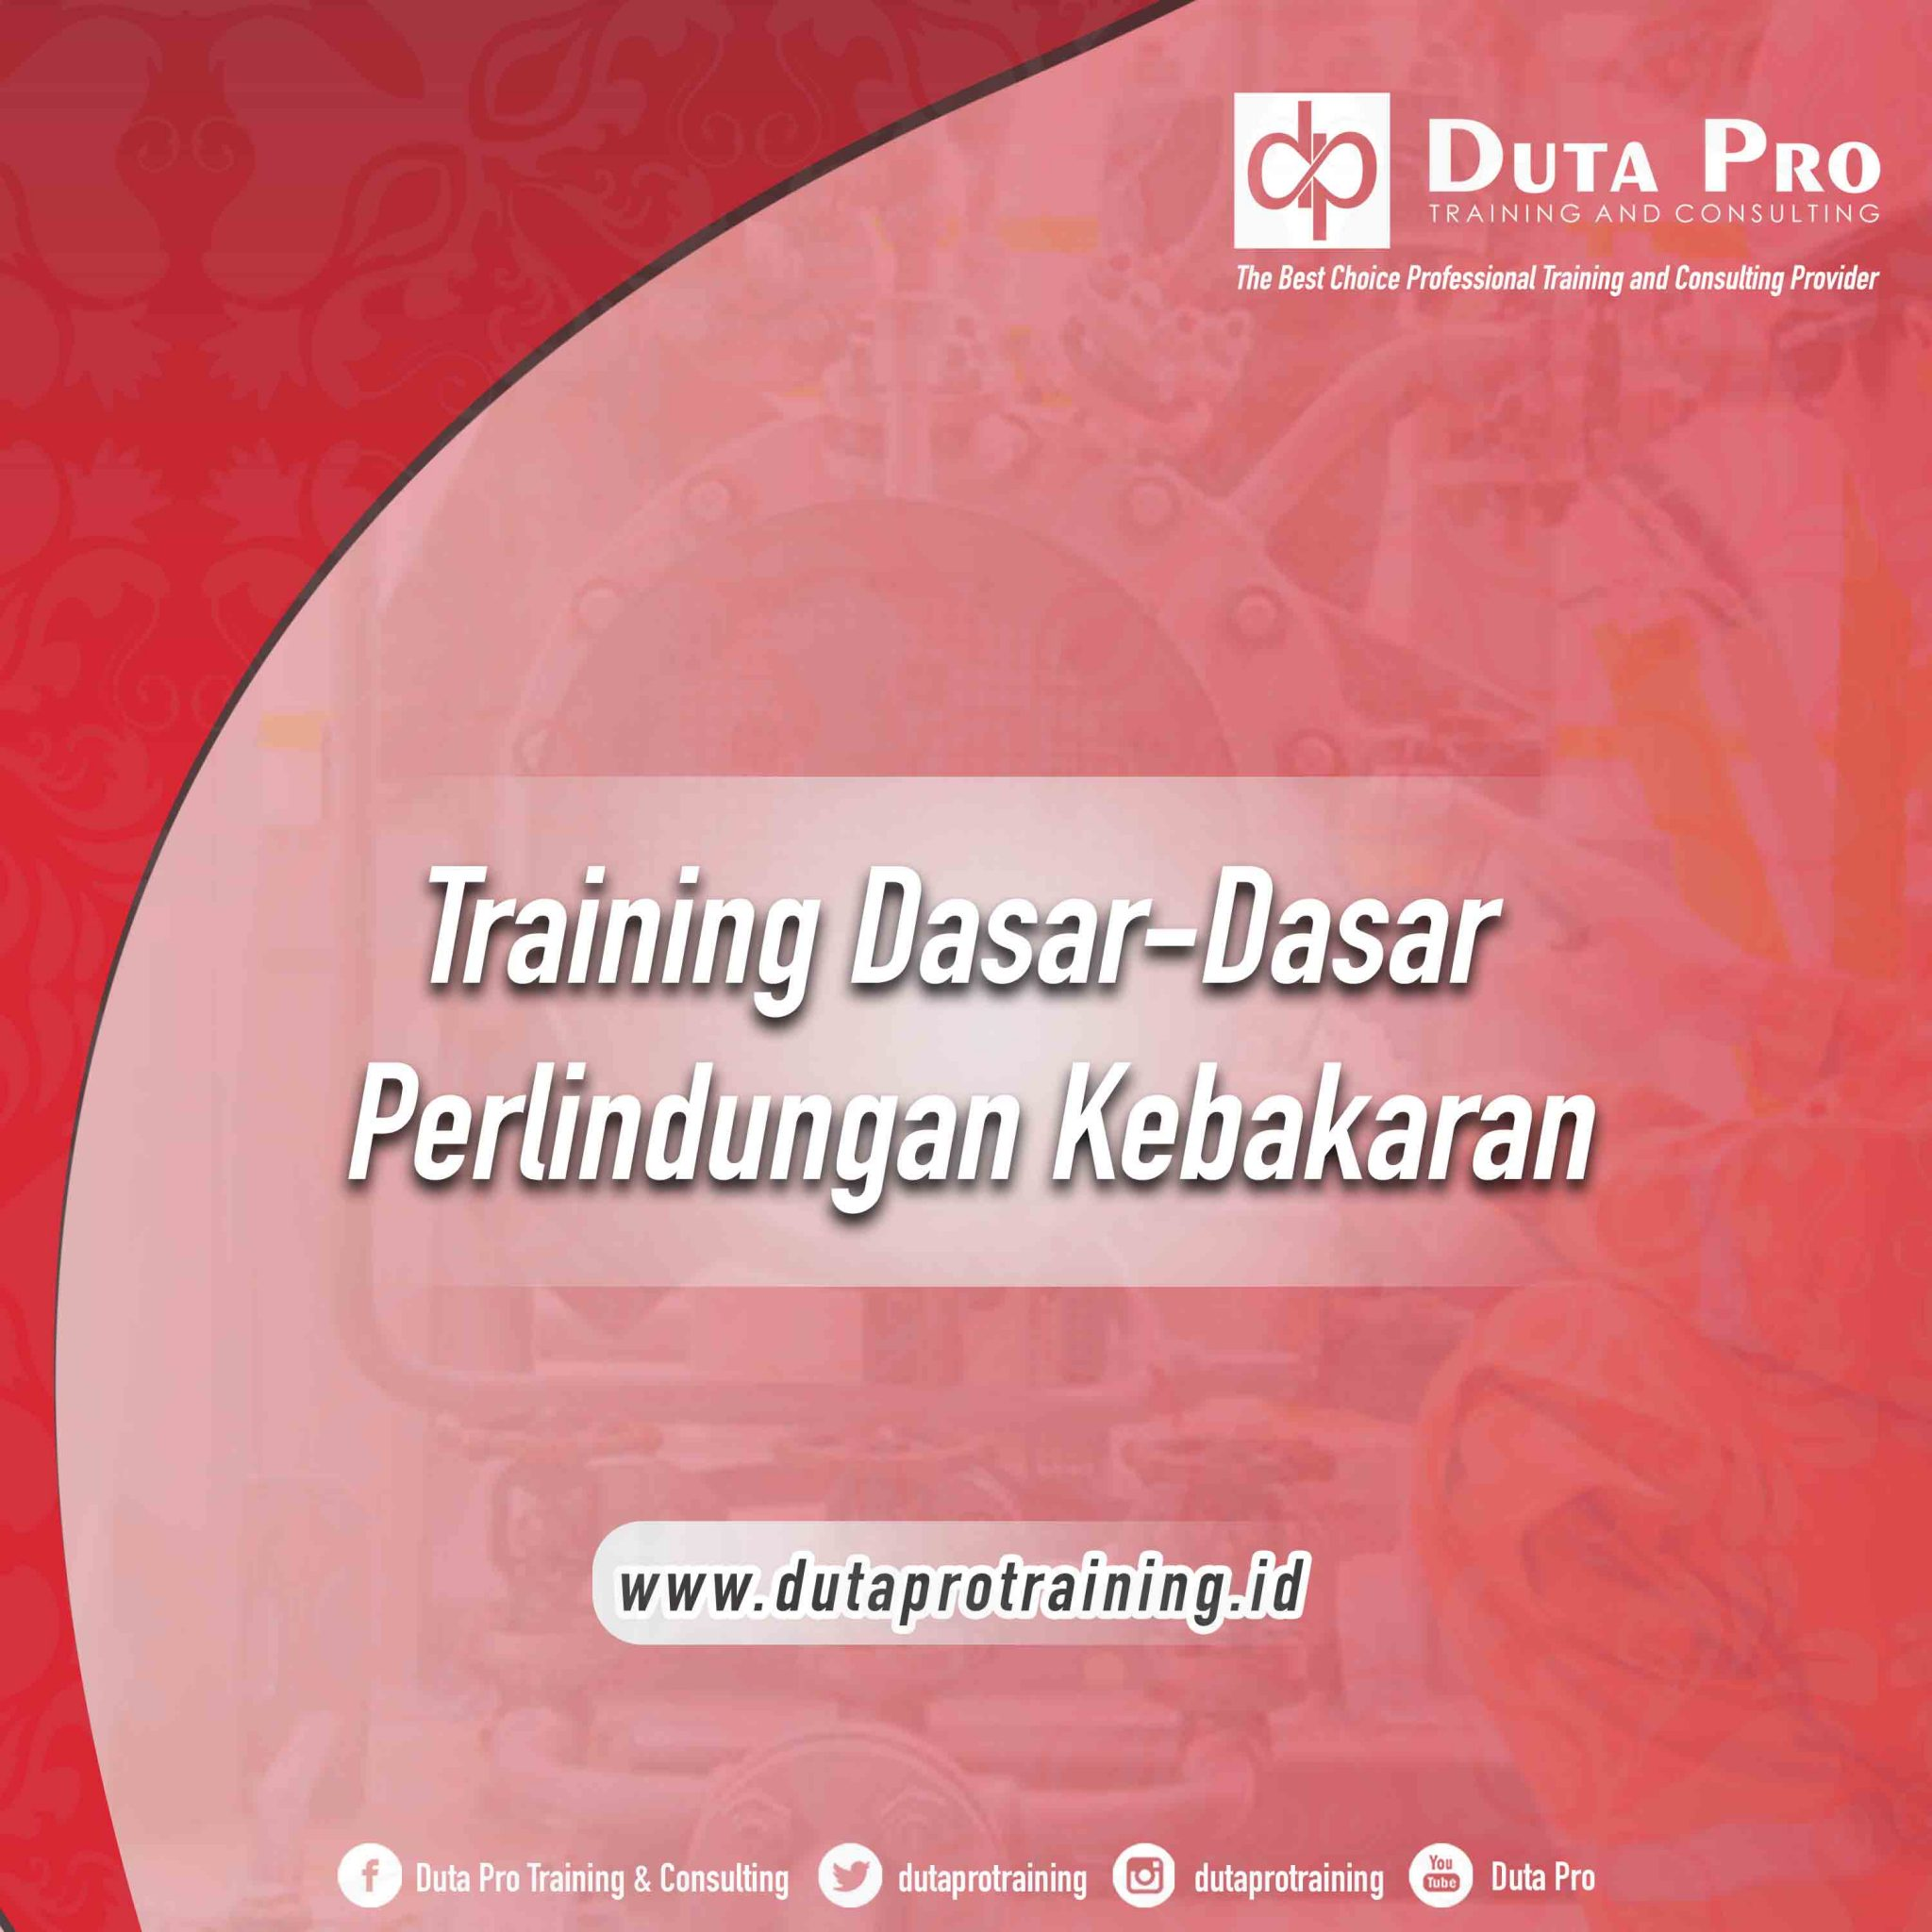 Training Dasar-Dasar Perlindungan Kebakaran